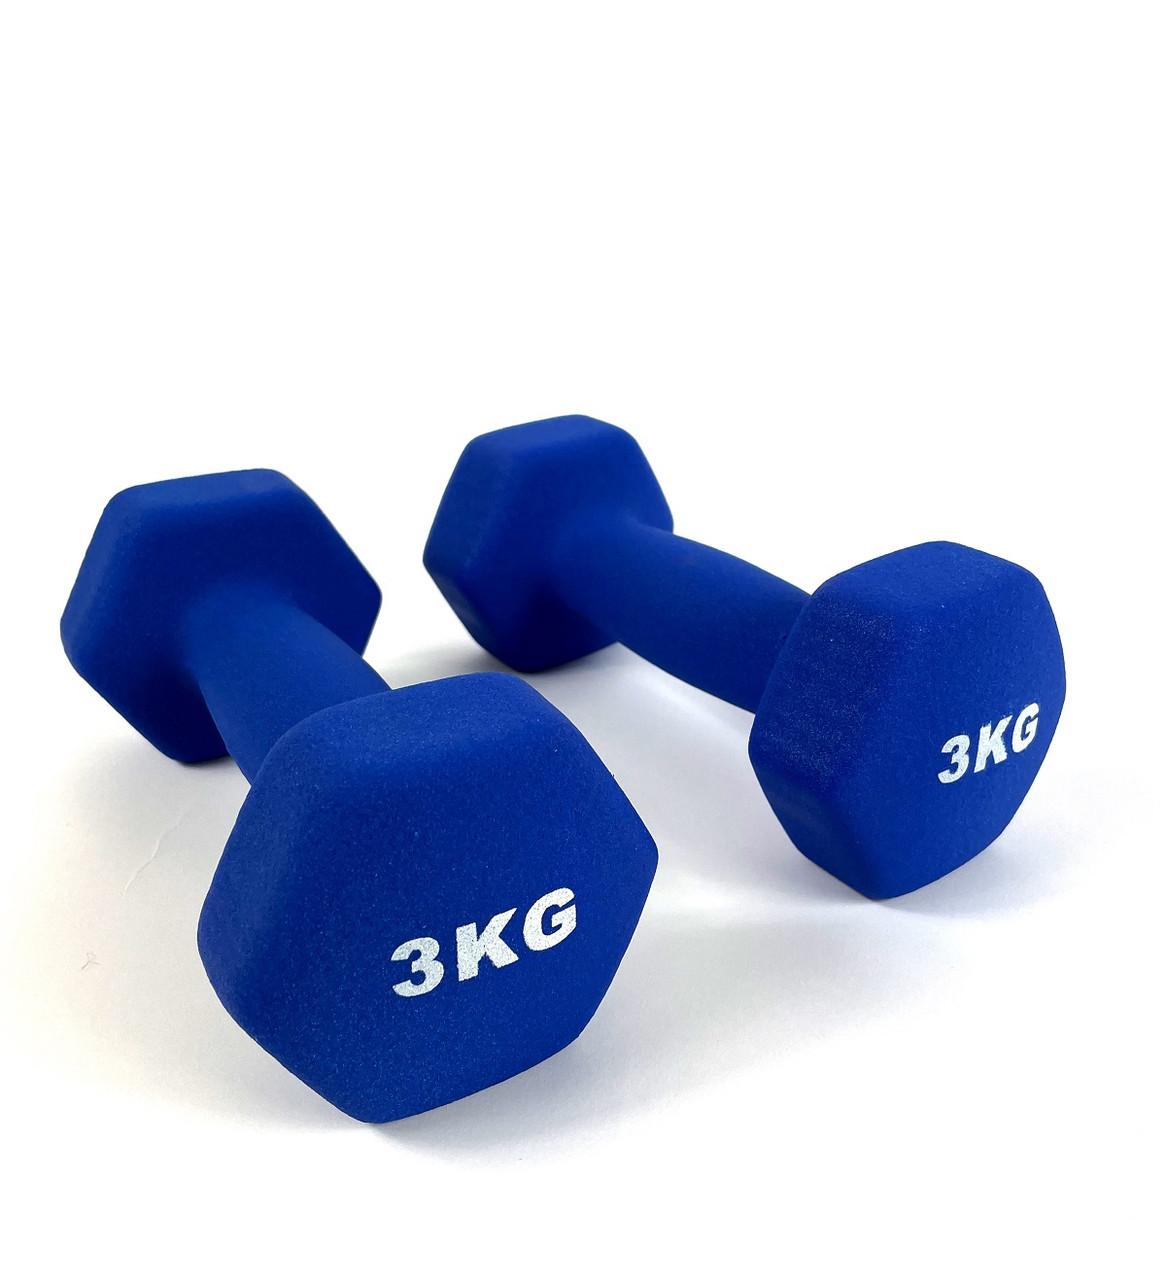 Гантелі металеві 2 по 3 кг з вініловим покриттям для фітнесу комплект (набір гантелей загальна вага 6 кг)